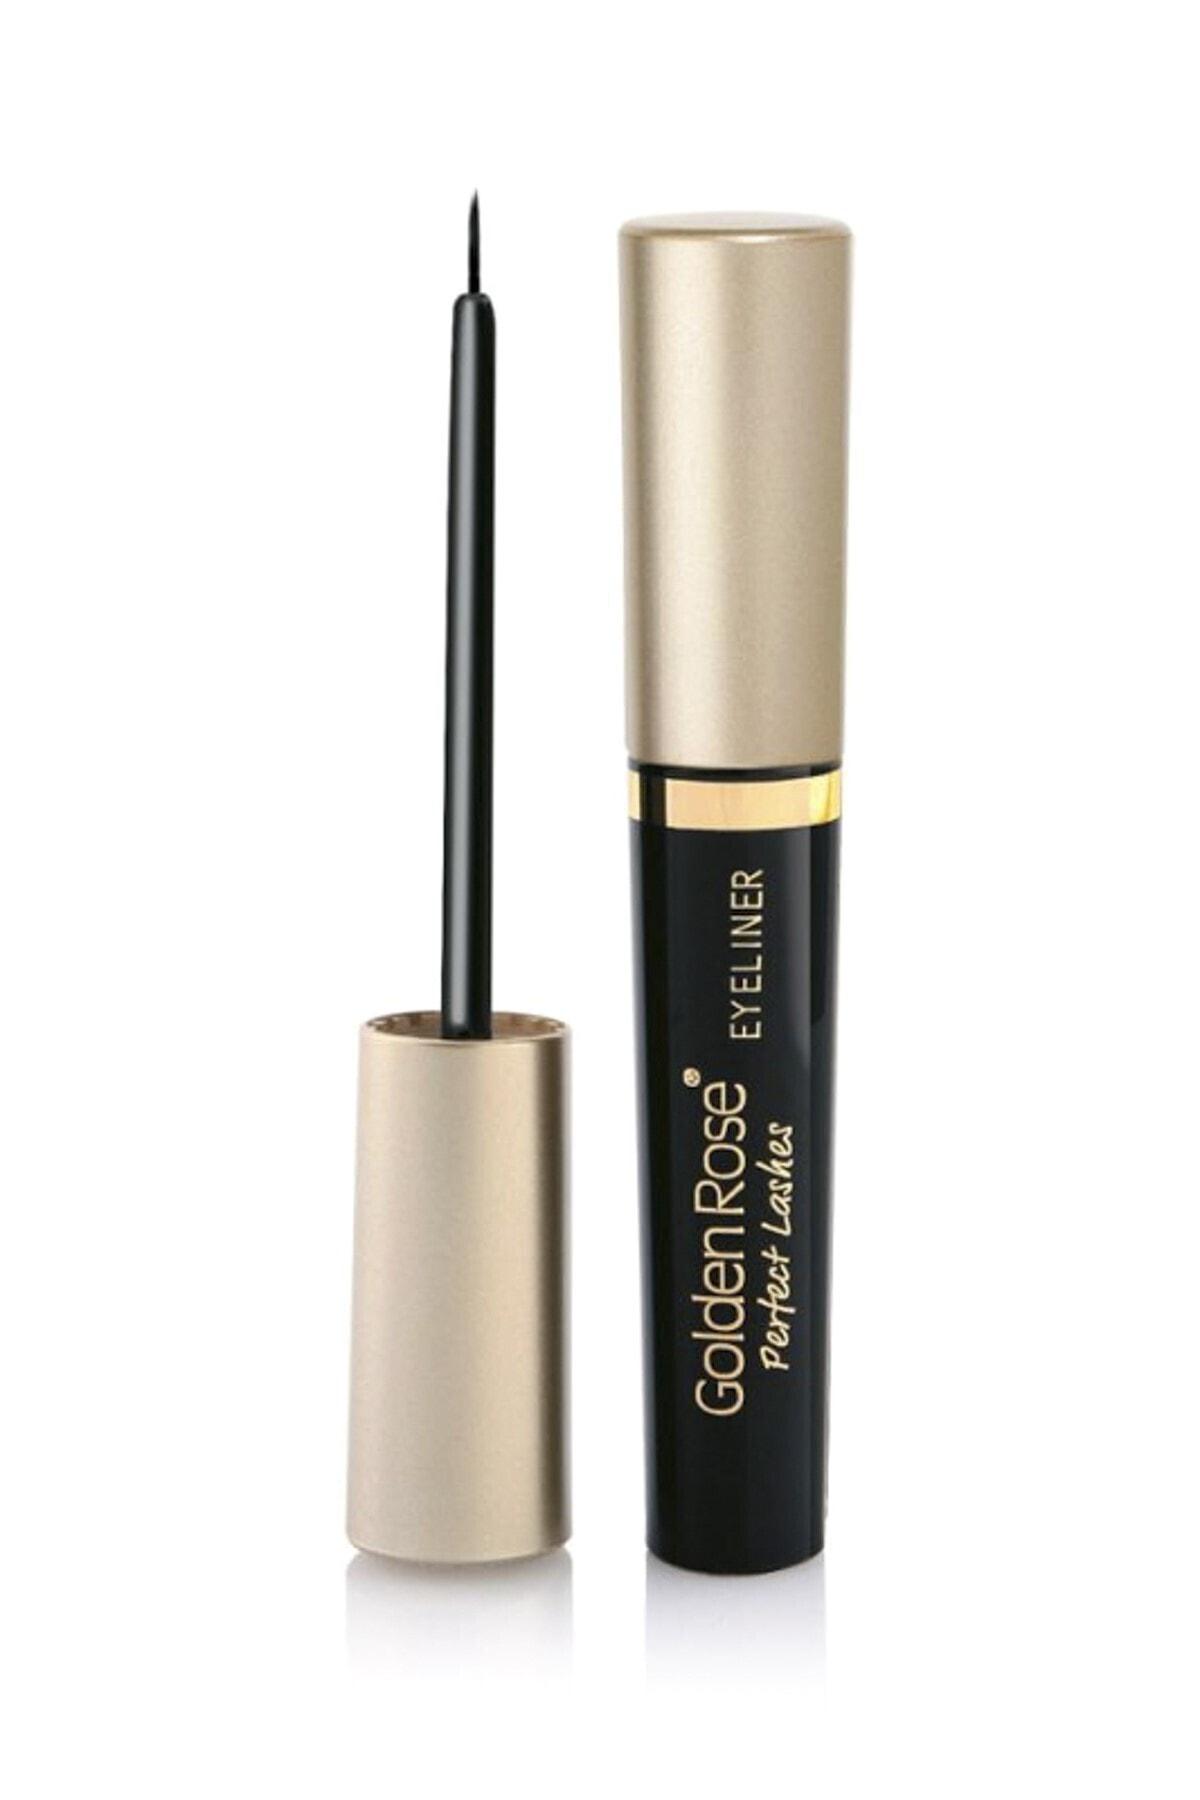 Golden Rose Siyah Eyeliner - Perfect Lashes Black Eyeliner 8691190066673 1